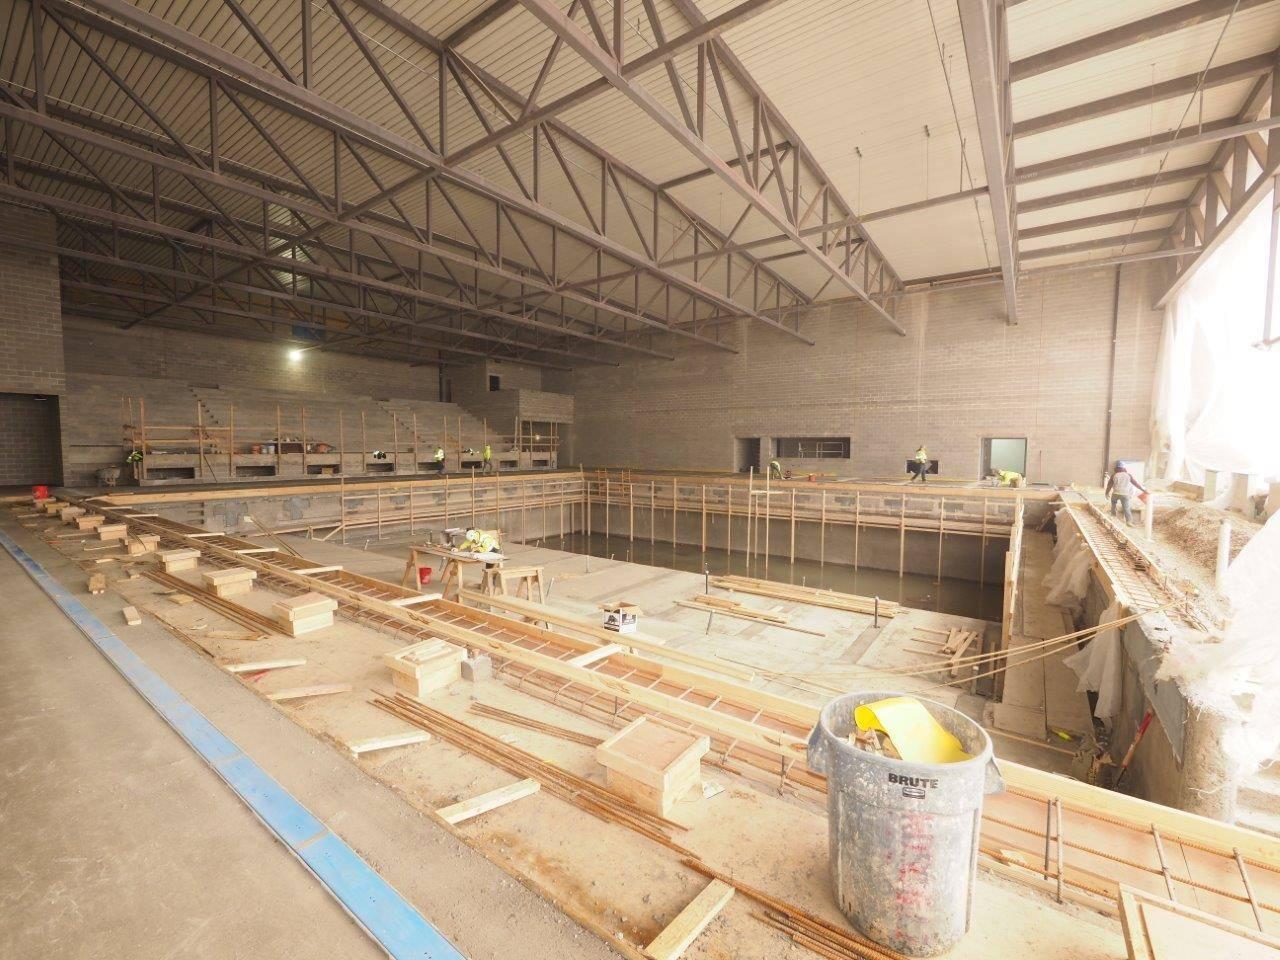 The new Upper Arlington High School natatorium